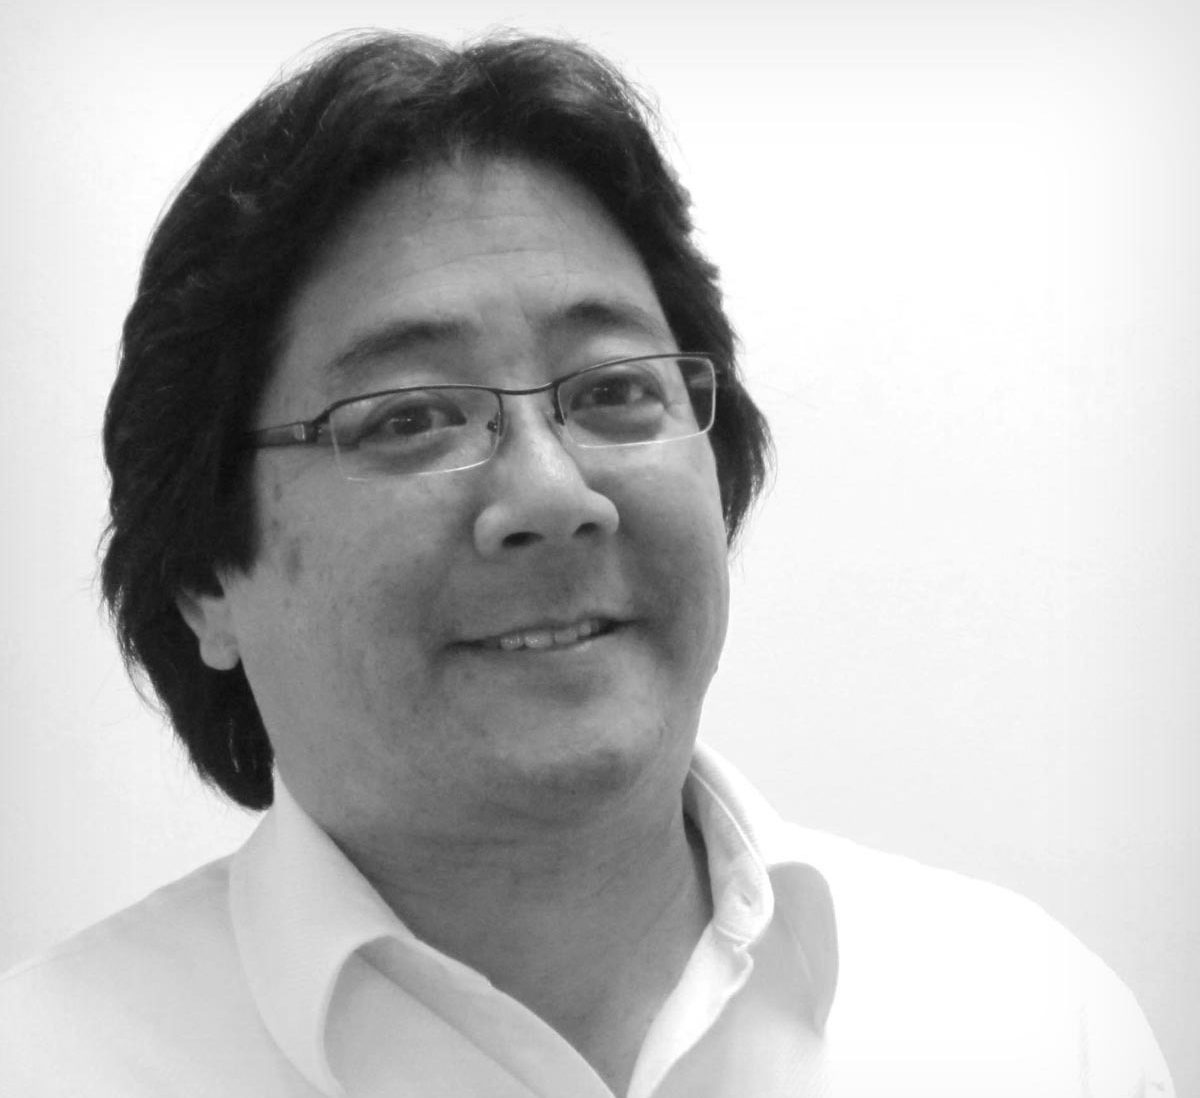 David Kutsunai, Managing Principal